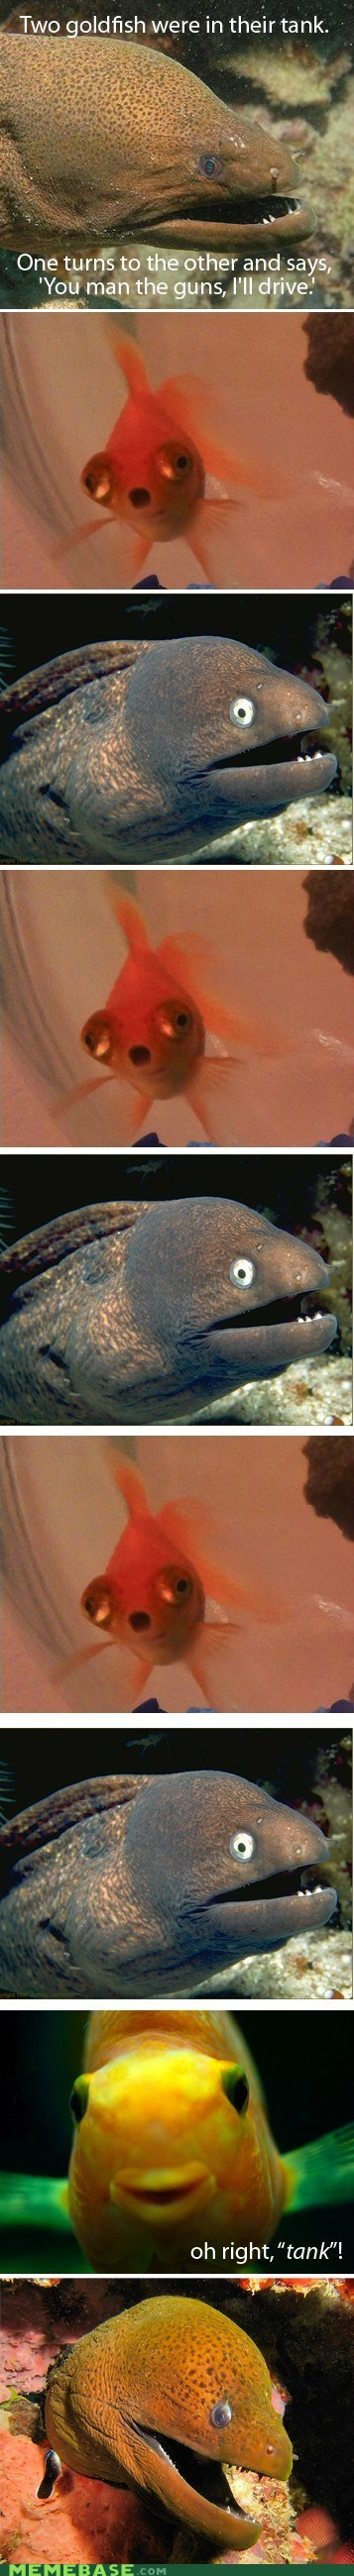 Bad Joke Eel fish jokes slow tank